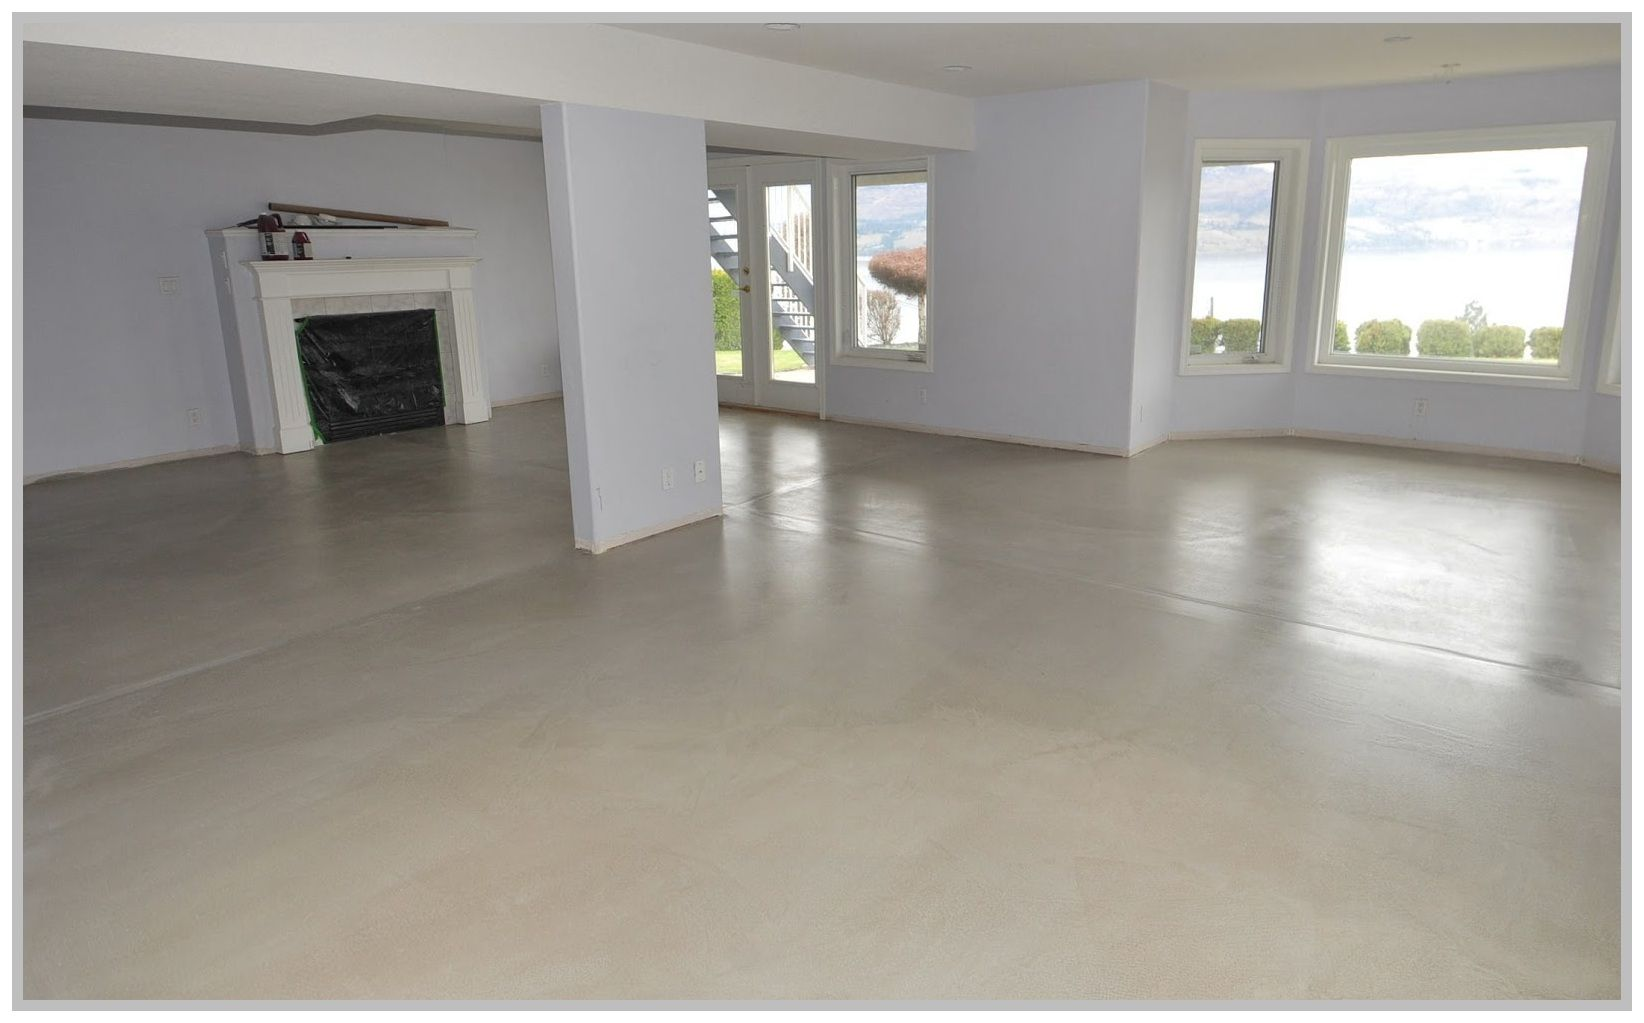 97 Reference Of Modern Interior Floor In 2020 Concrete Floors Modern Flooring Flooring